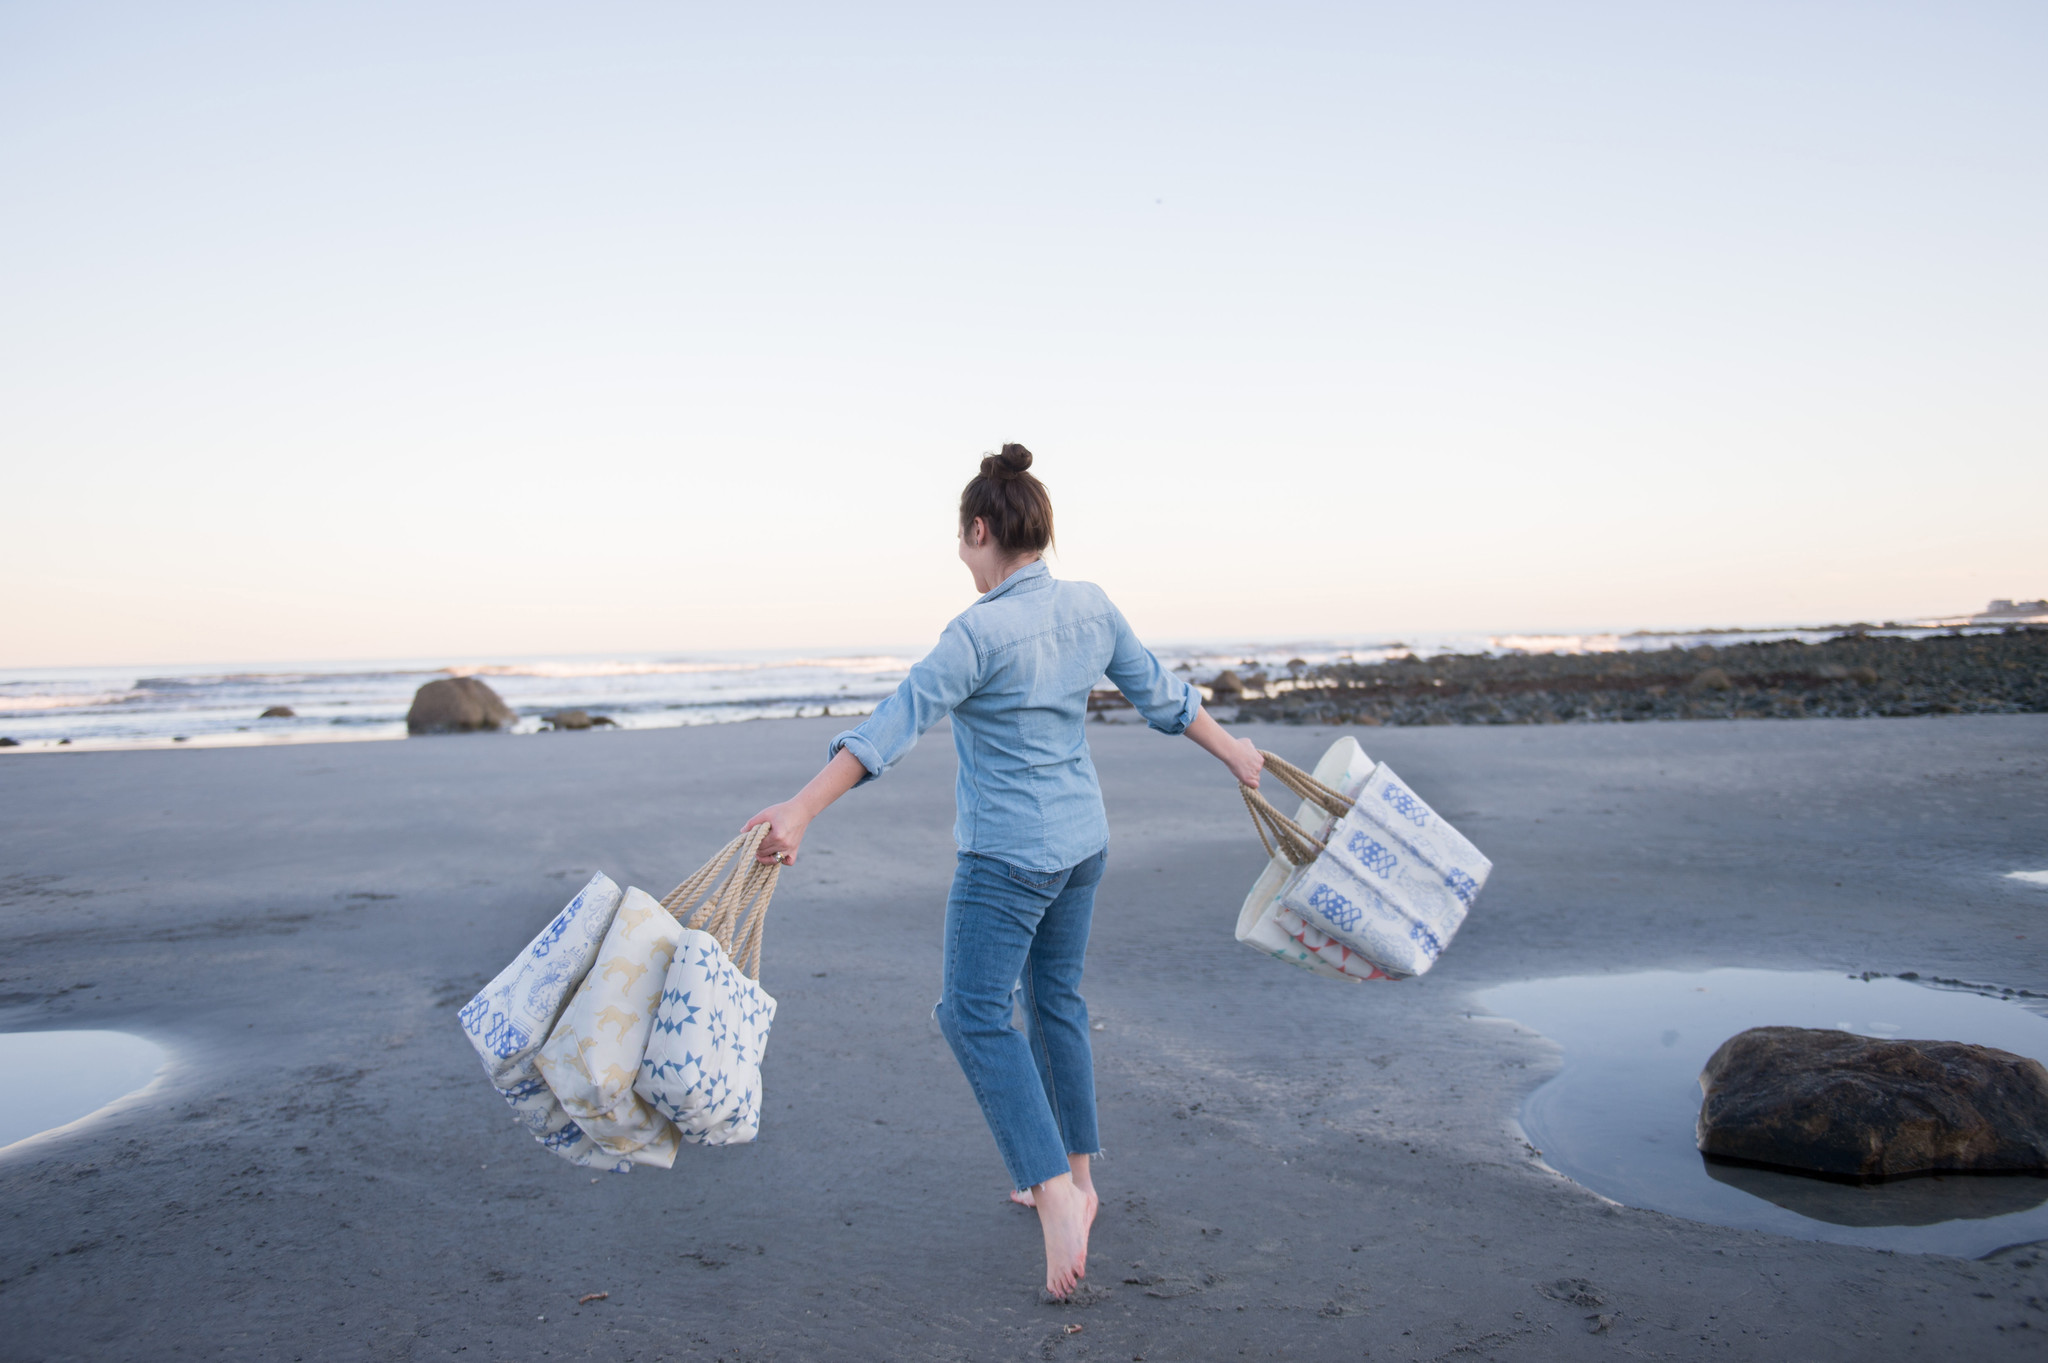 Just In! New Sara Fitz Sea Bags at Daytrip Society